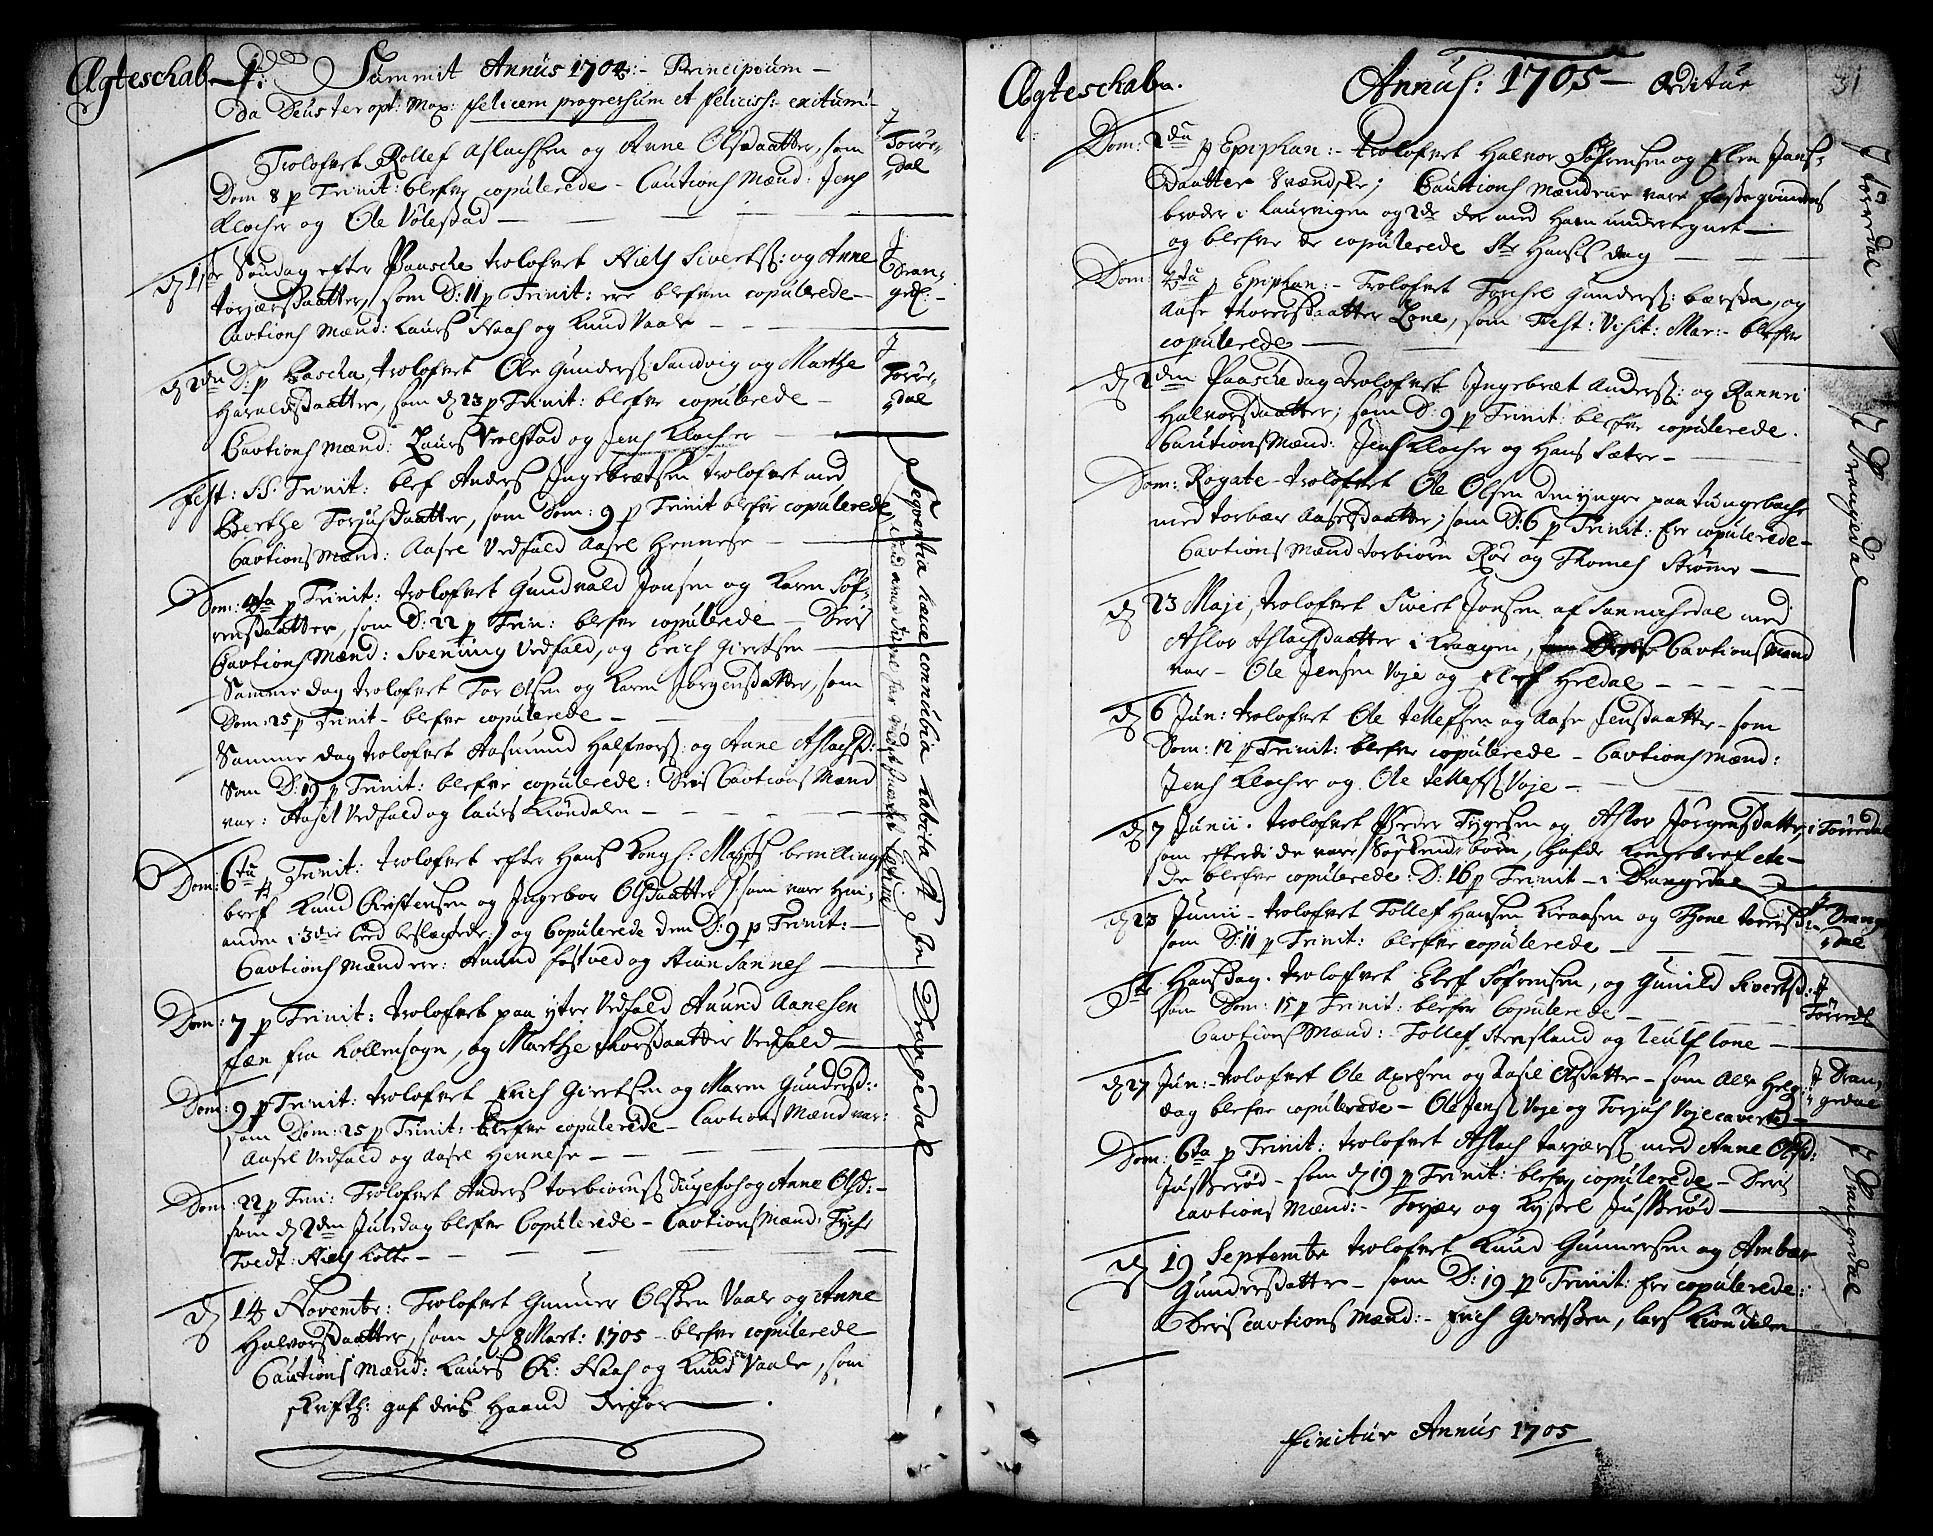 SAKO, Drangedal kirkebøker, F/Fa/L0001: Ministerialbok nr. 1, 1697-1767, s. 31